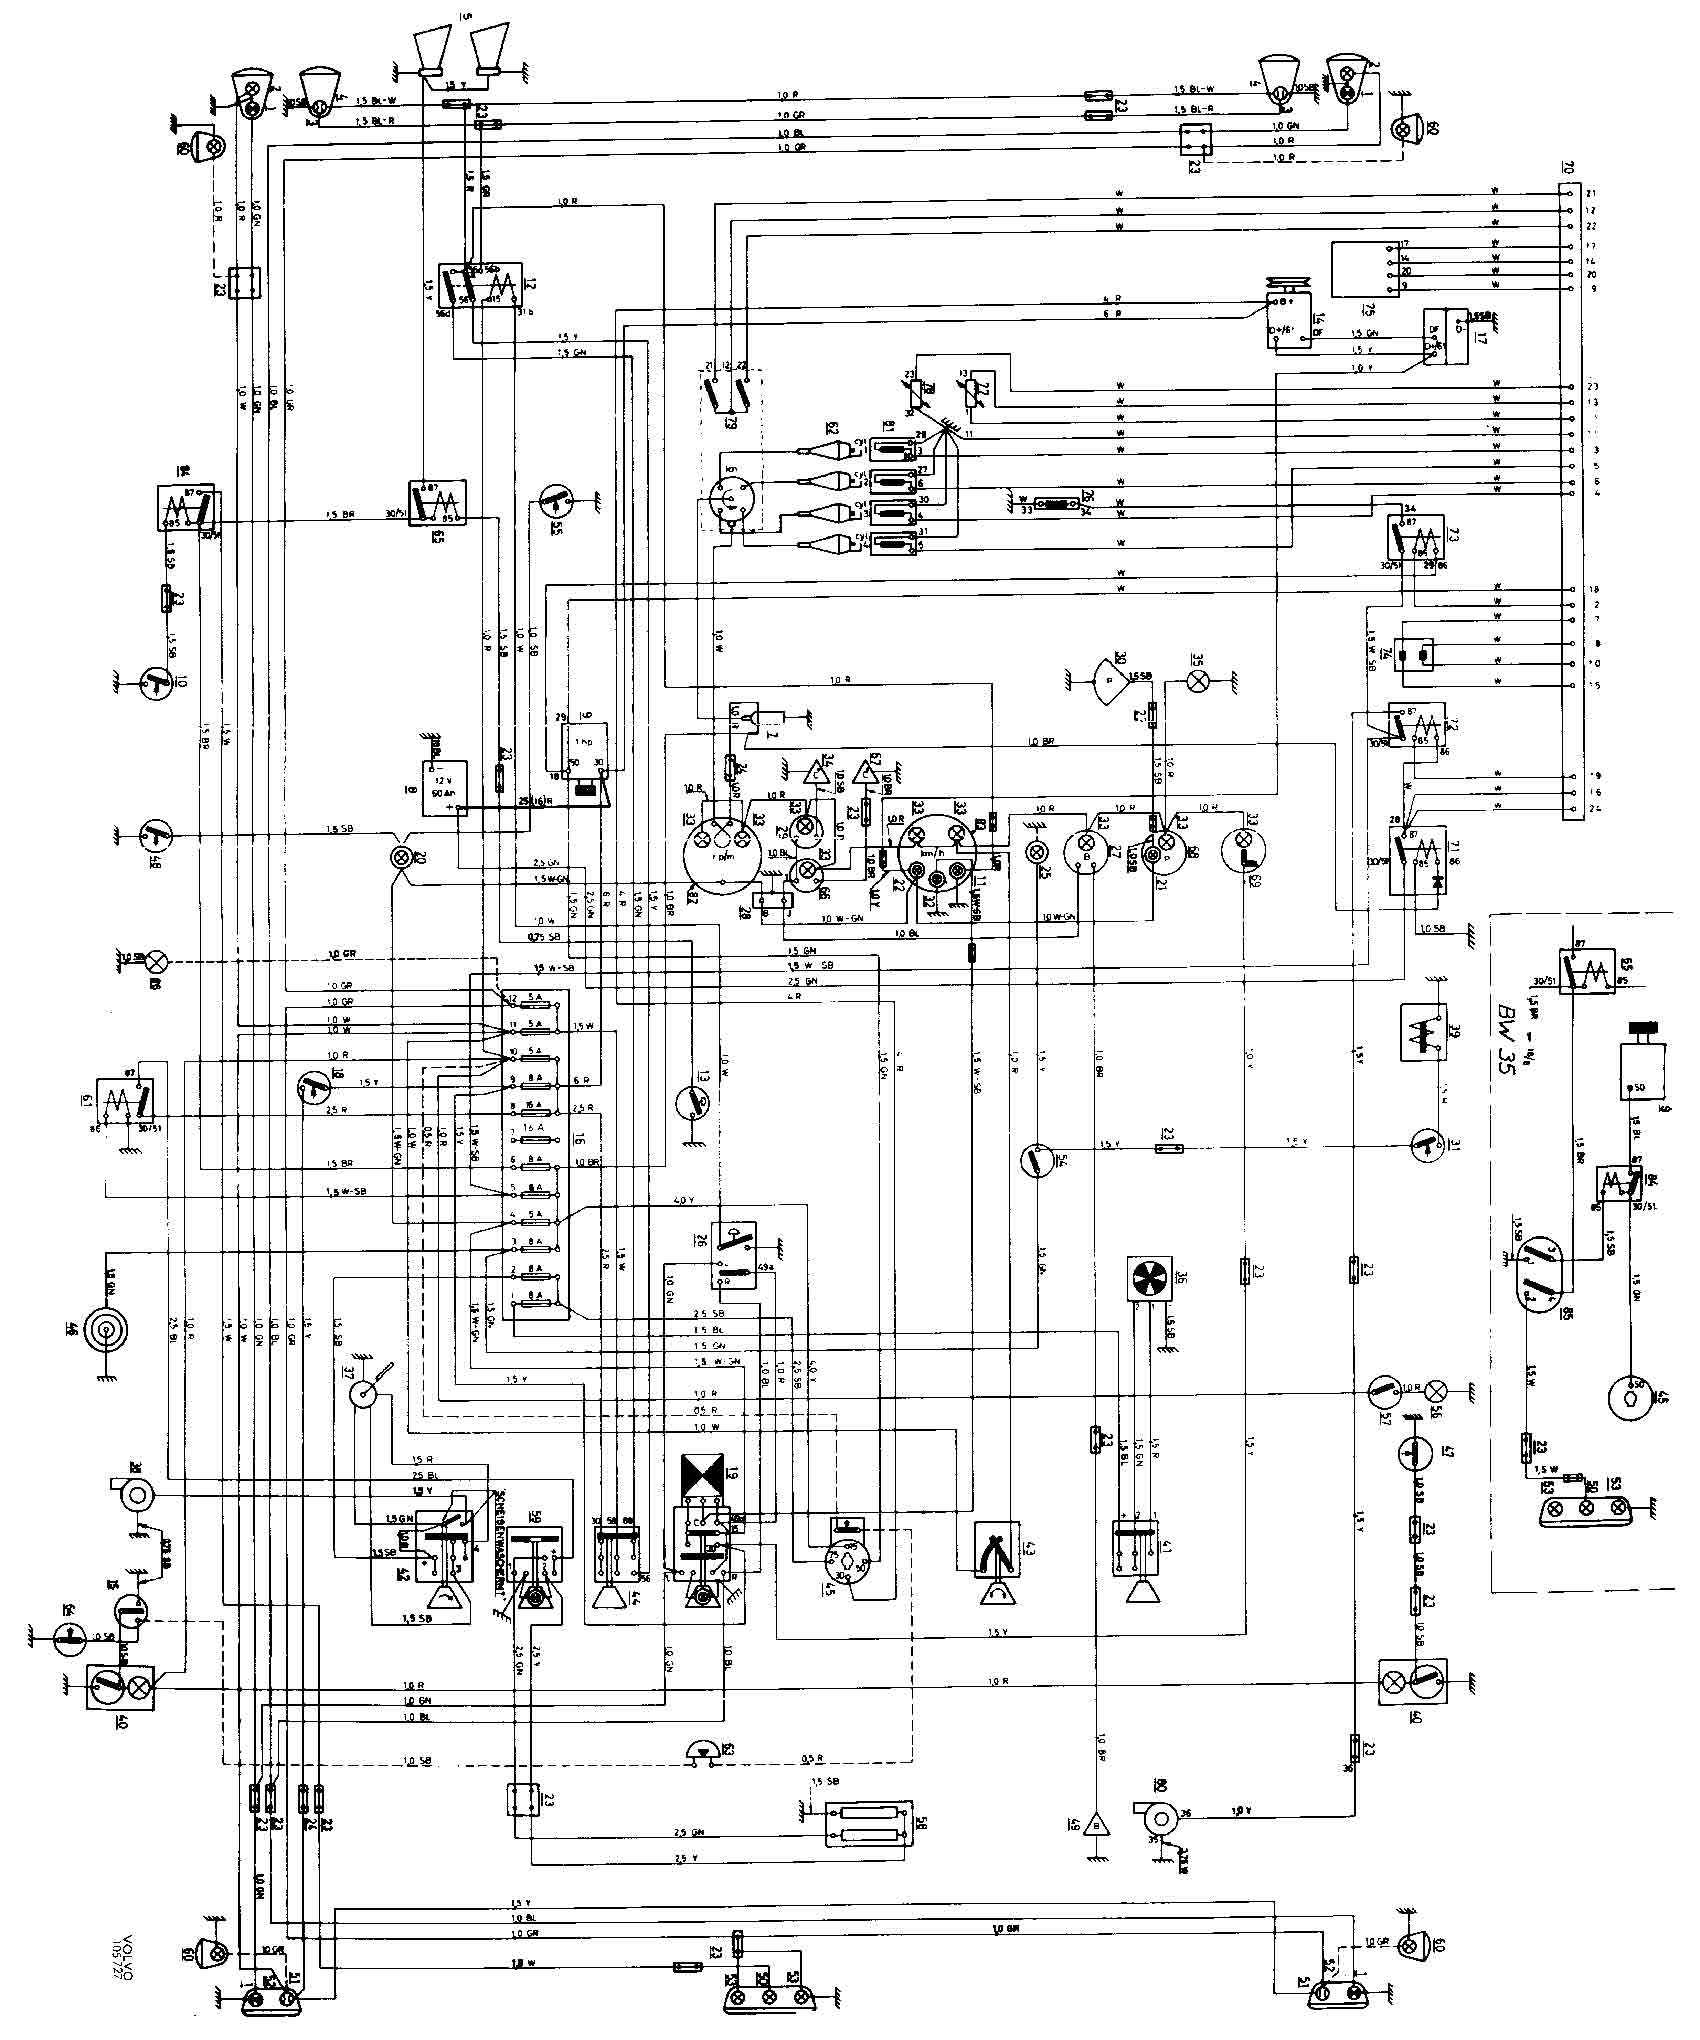 wiring diagram c 130 c 130j engine diagram electrical wiring diagram hight resolution of 2011 volvo vnl wiring wiring diagram for you kazuma wiring schematic 2007 volvo